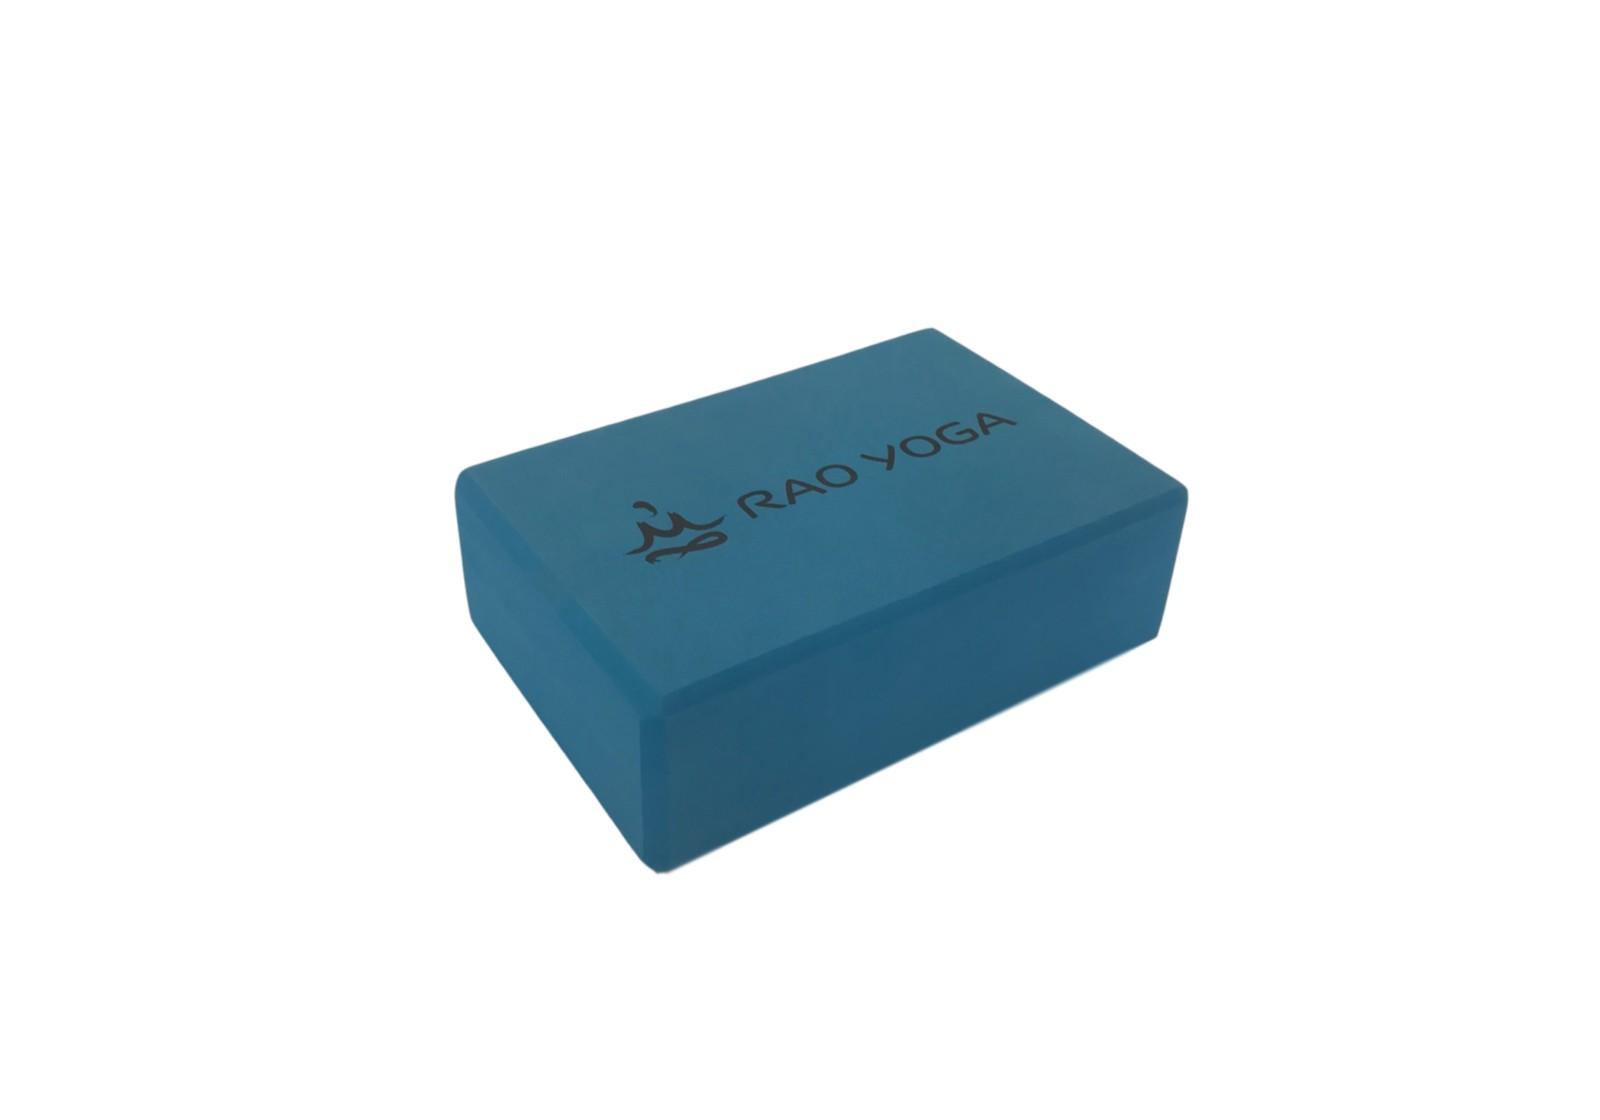 Block-dlja-yogi-Rao.jpg